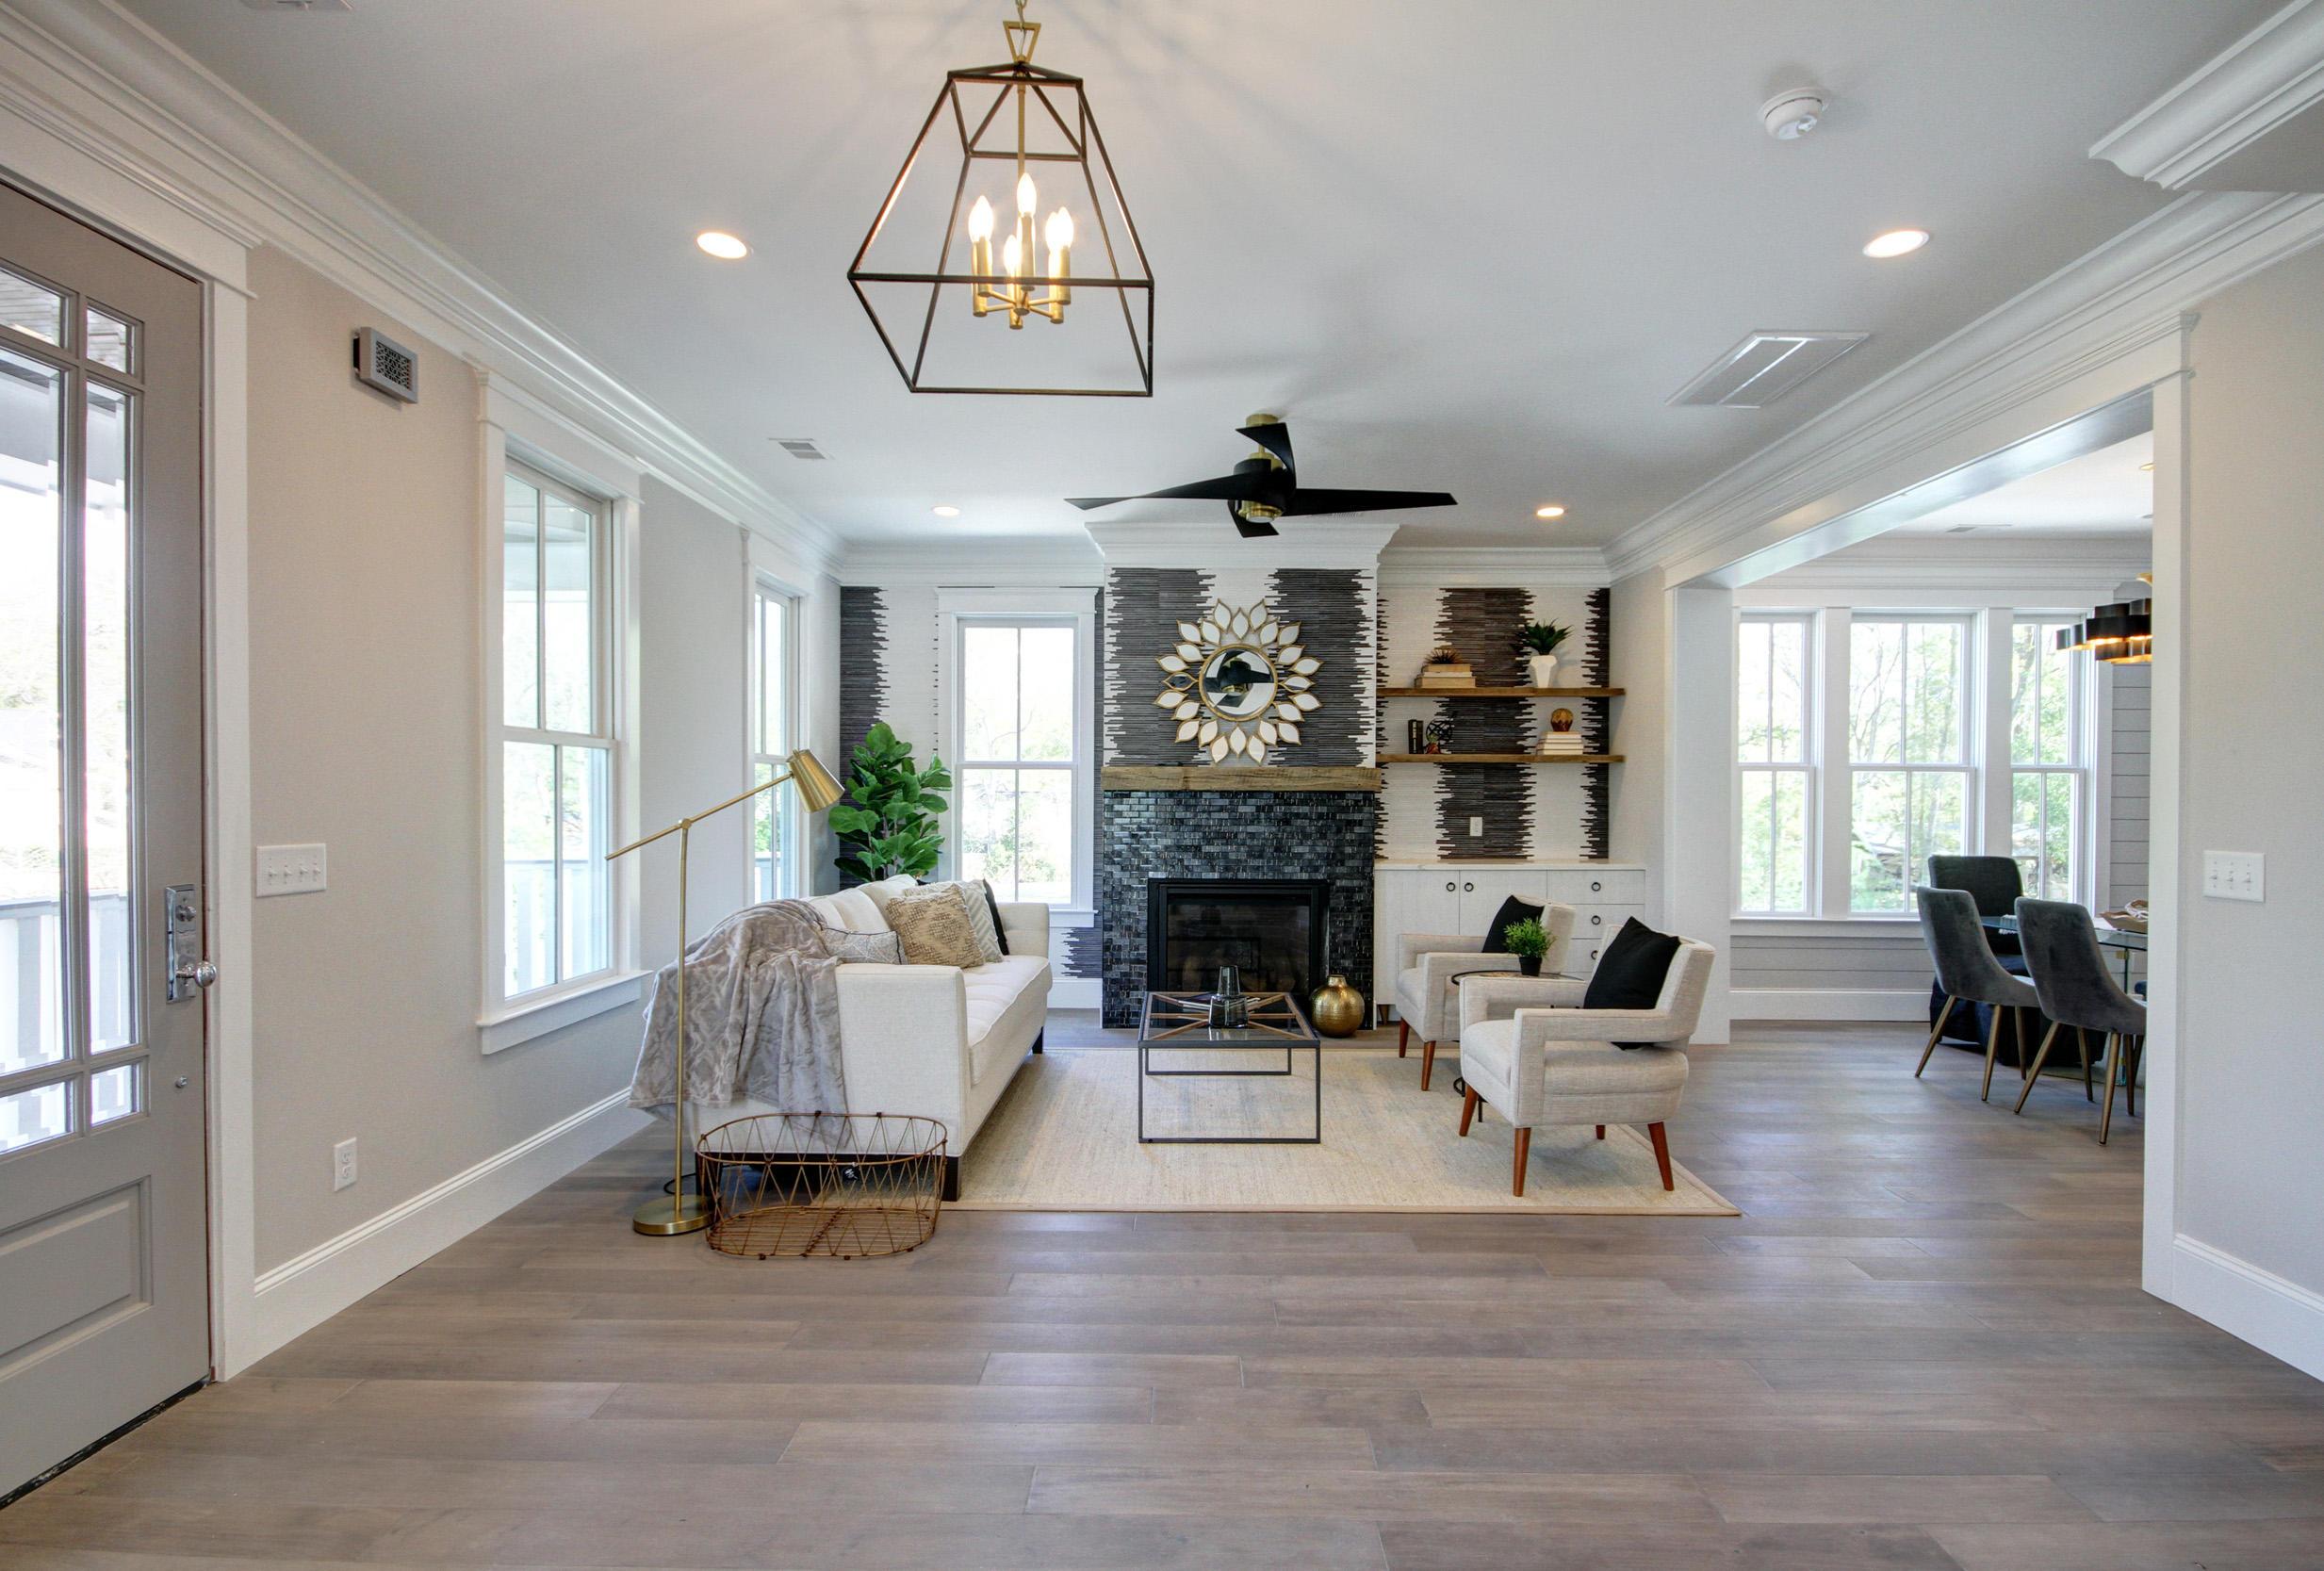 Mathis Ferry Court Homes For Sale - 1212 Clonmel Place, Mount Pleasant, SC - 13